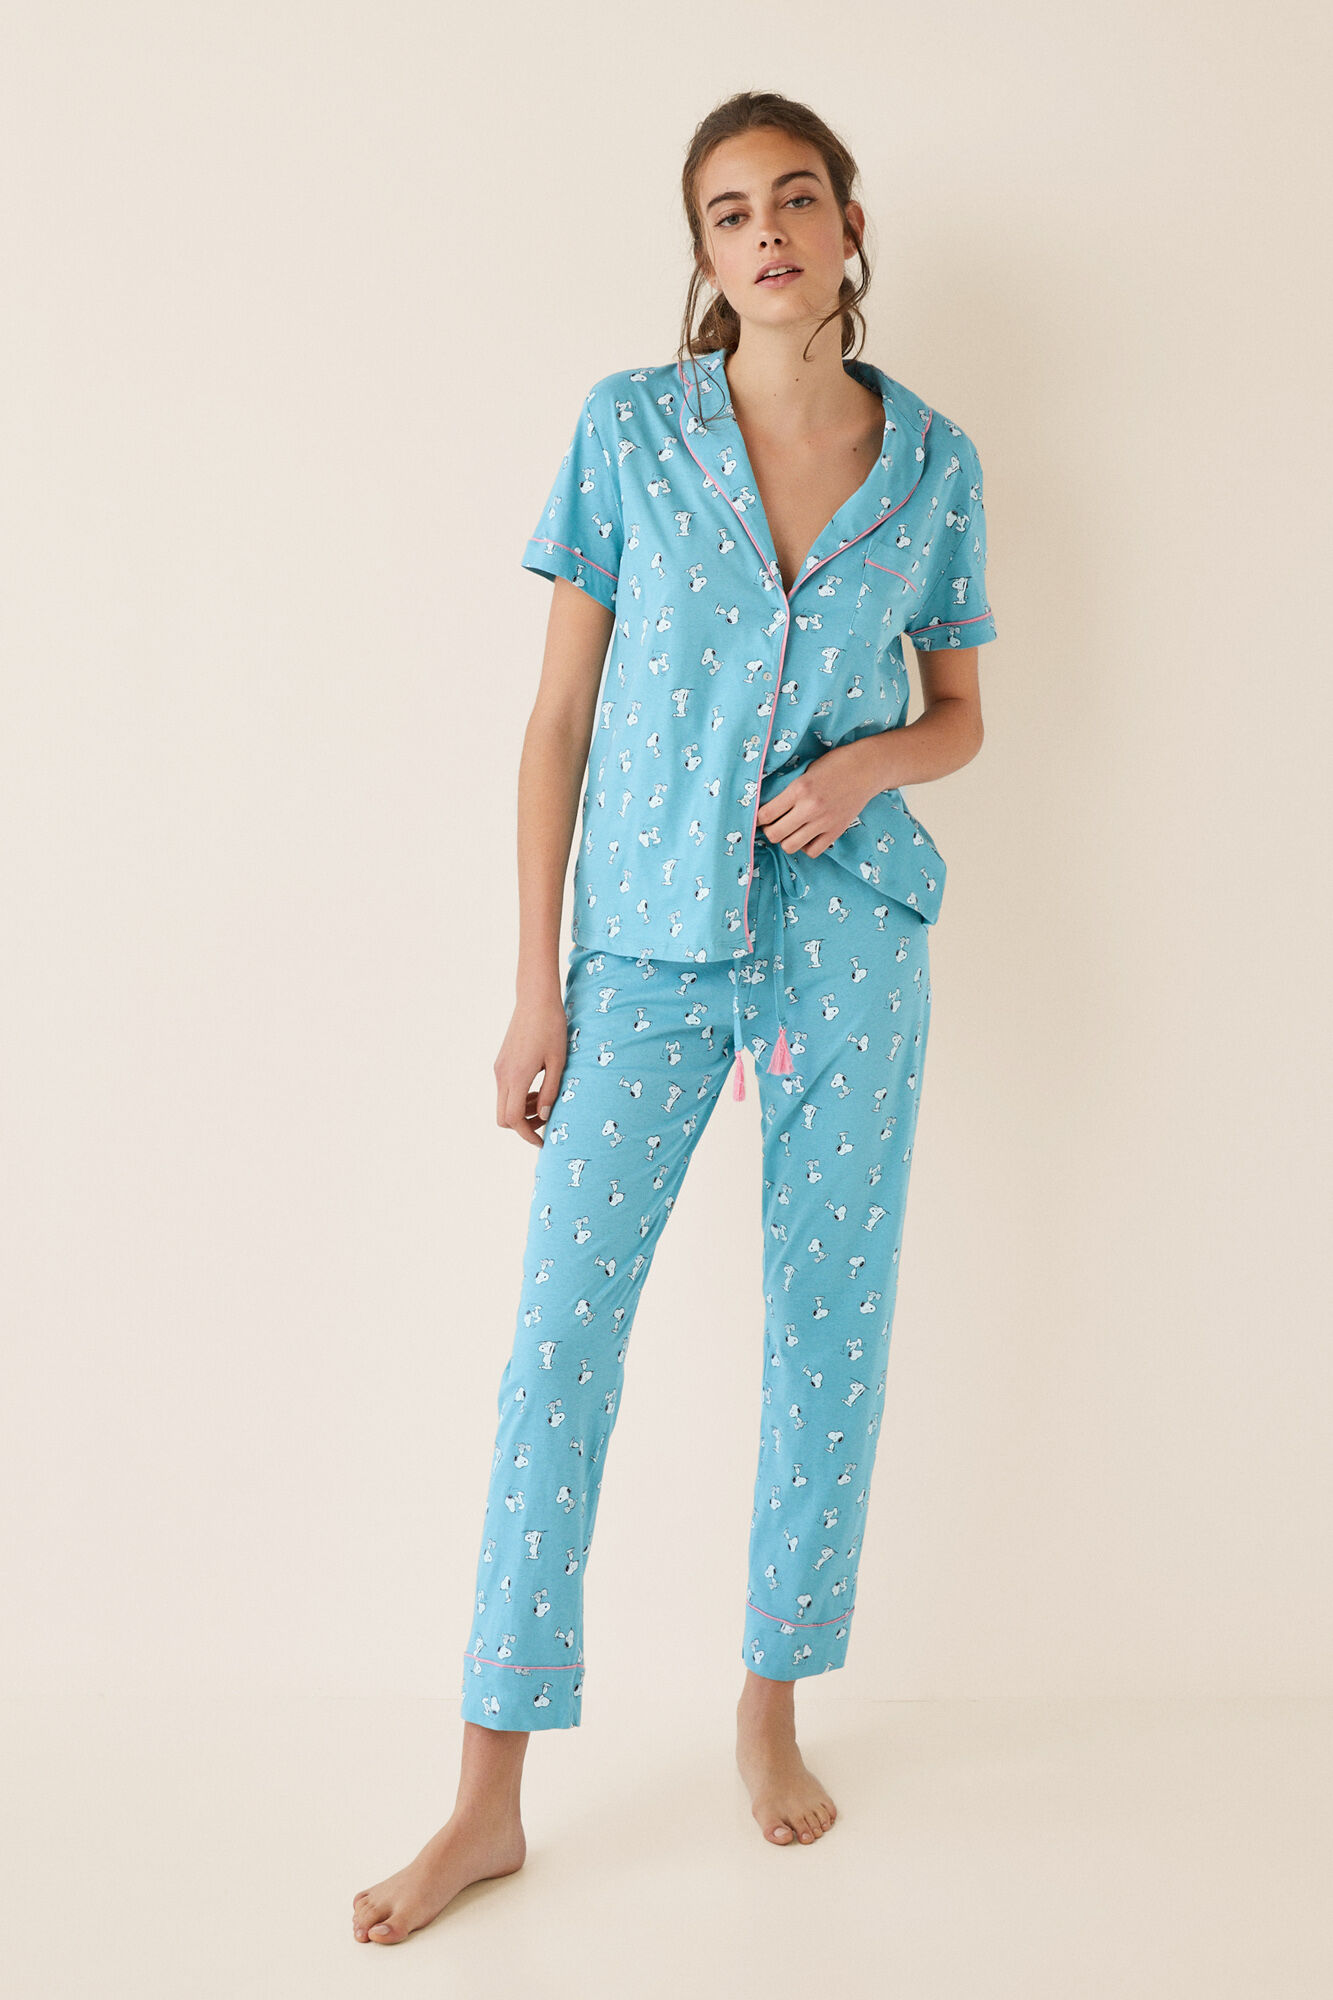 Pyjama Long Chemisier Bleu Women'secret SnoopyPyjamas Longs N80XnOwPk